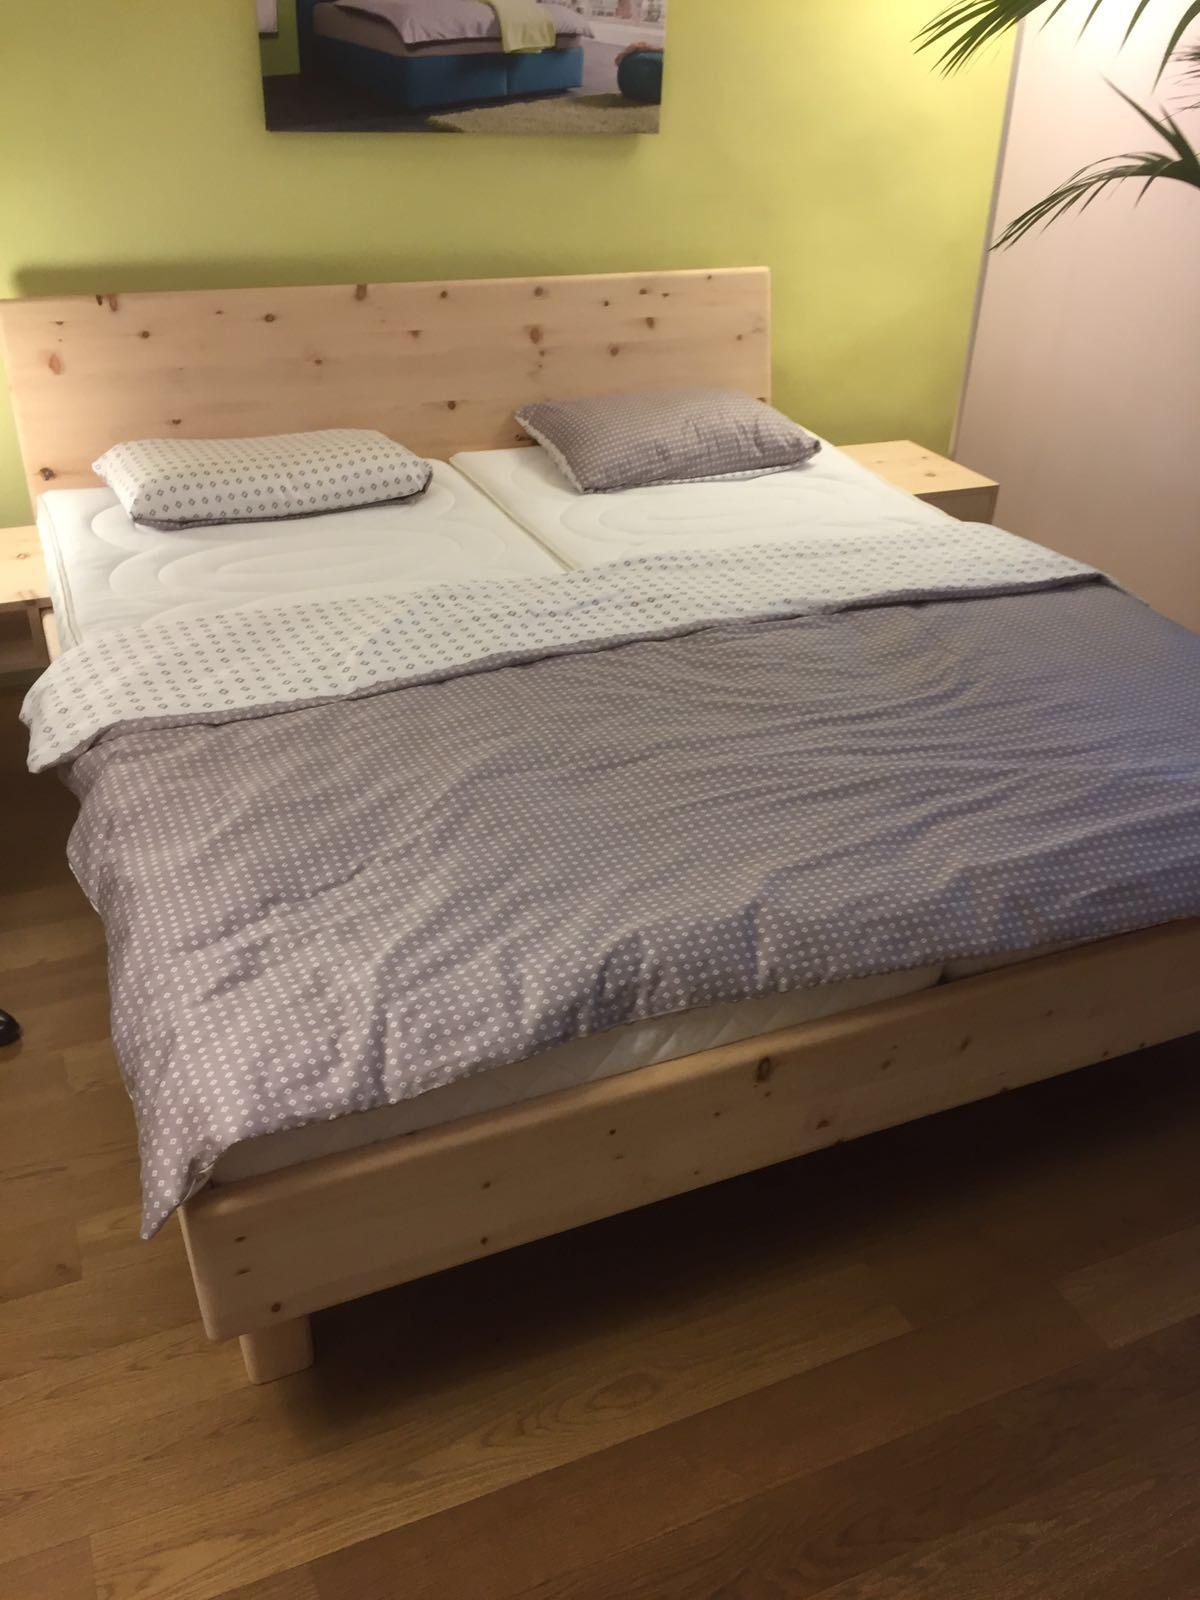 Arvenholz Bett - natürlich